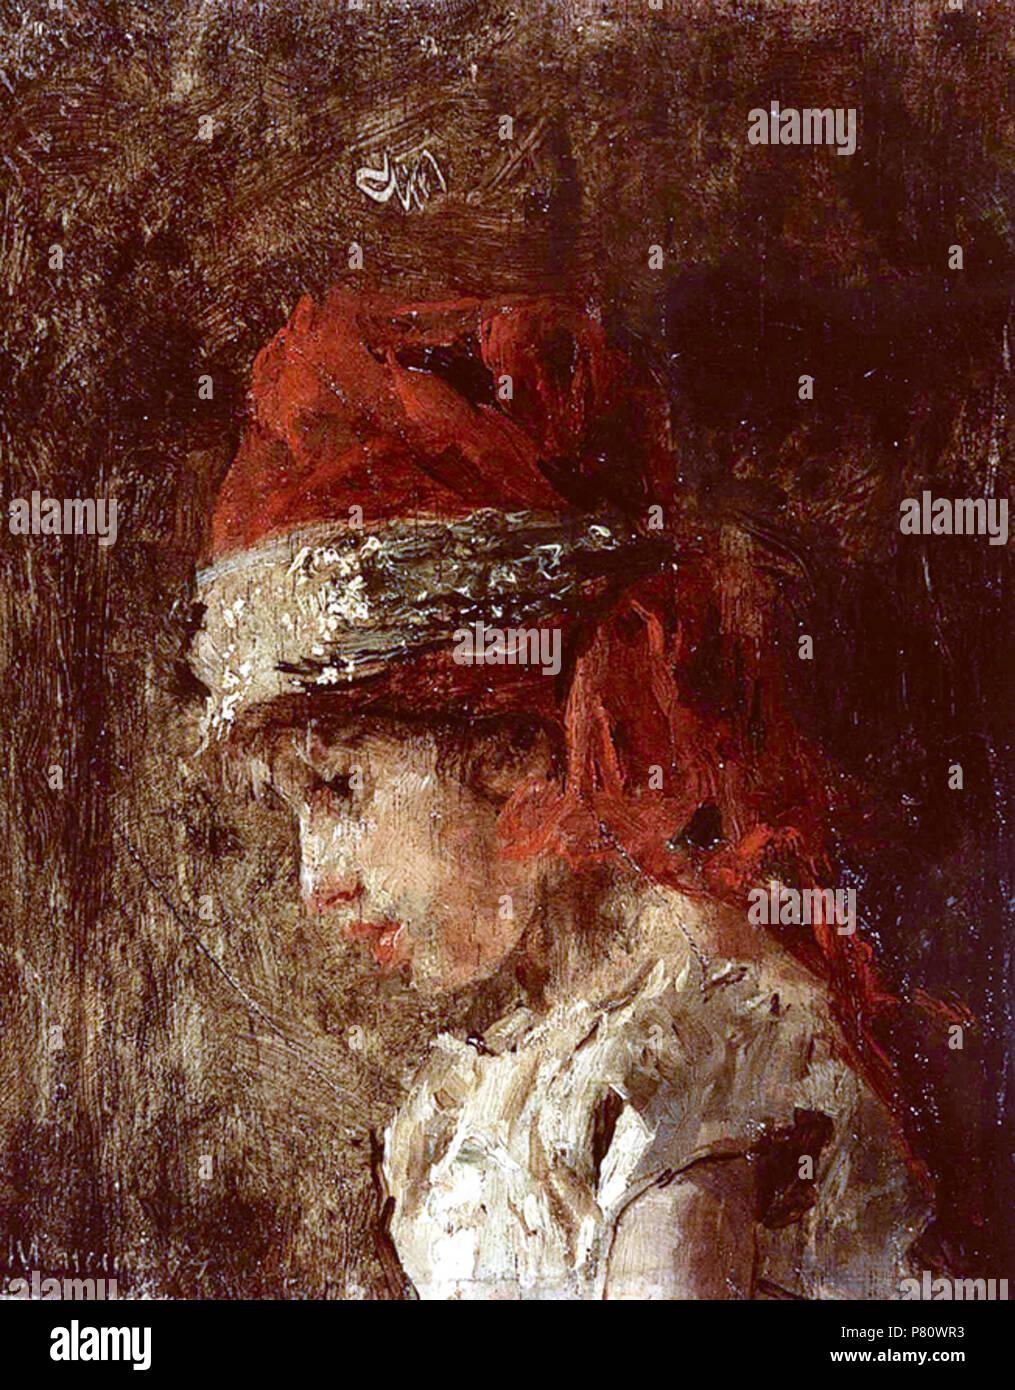 Luigiello con turbante . 1878 252 Luigiello con turbante mancini Immagini Stock